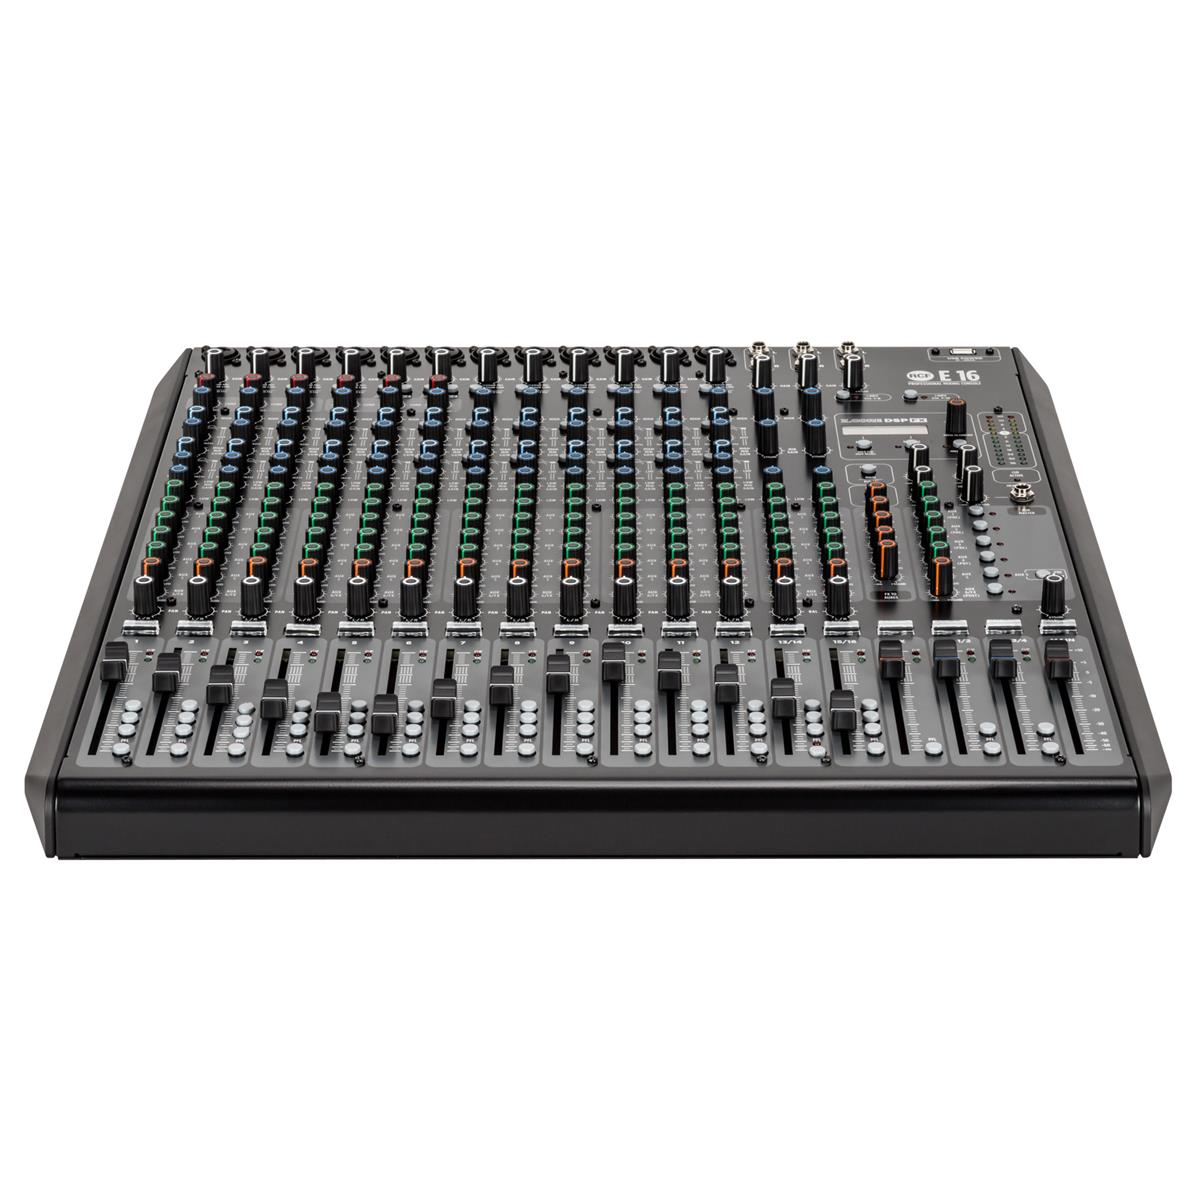 RCF E 16 16-kanals analog mikser med FX/USB